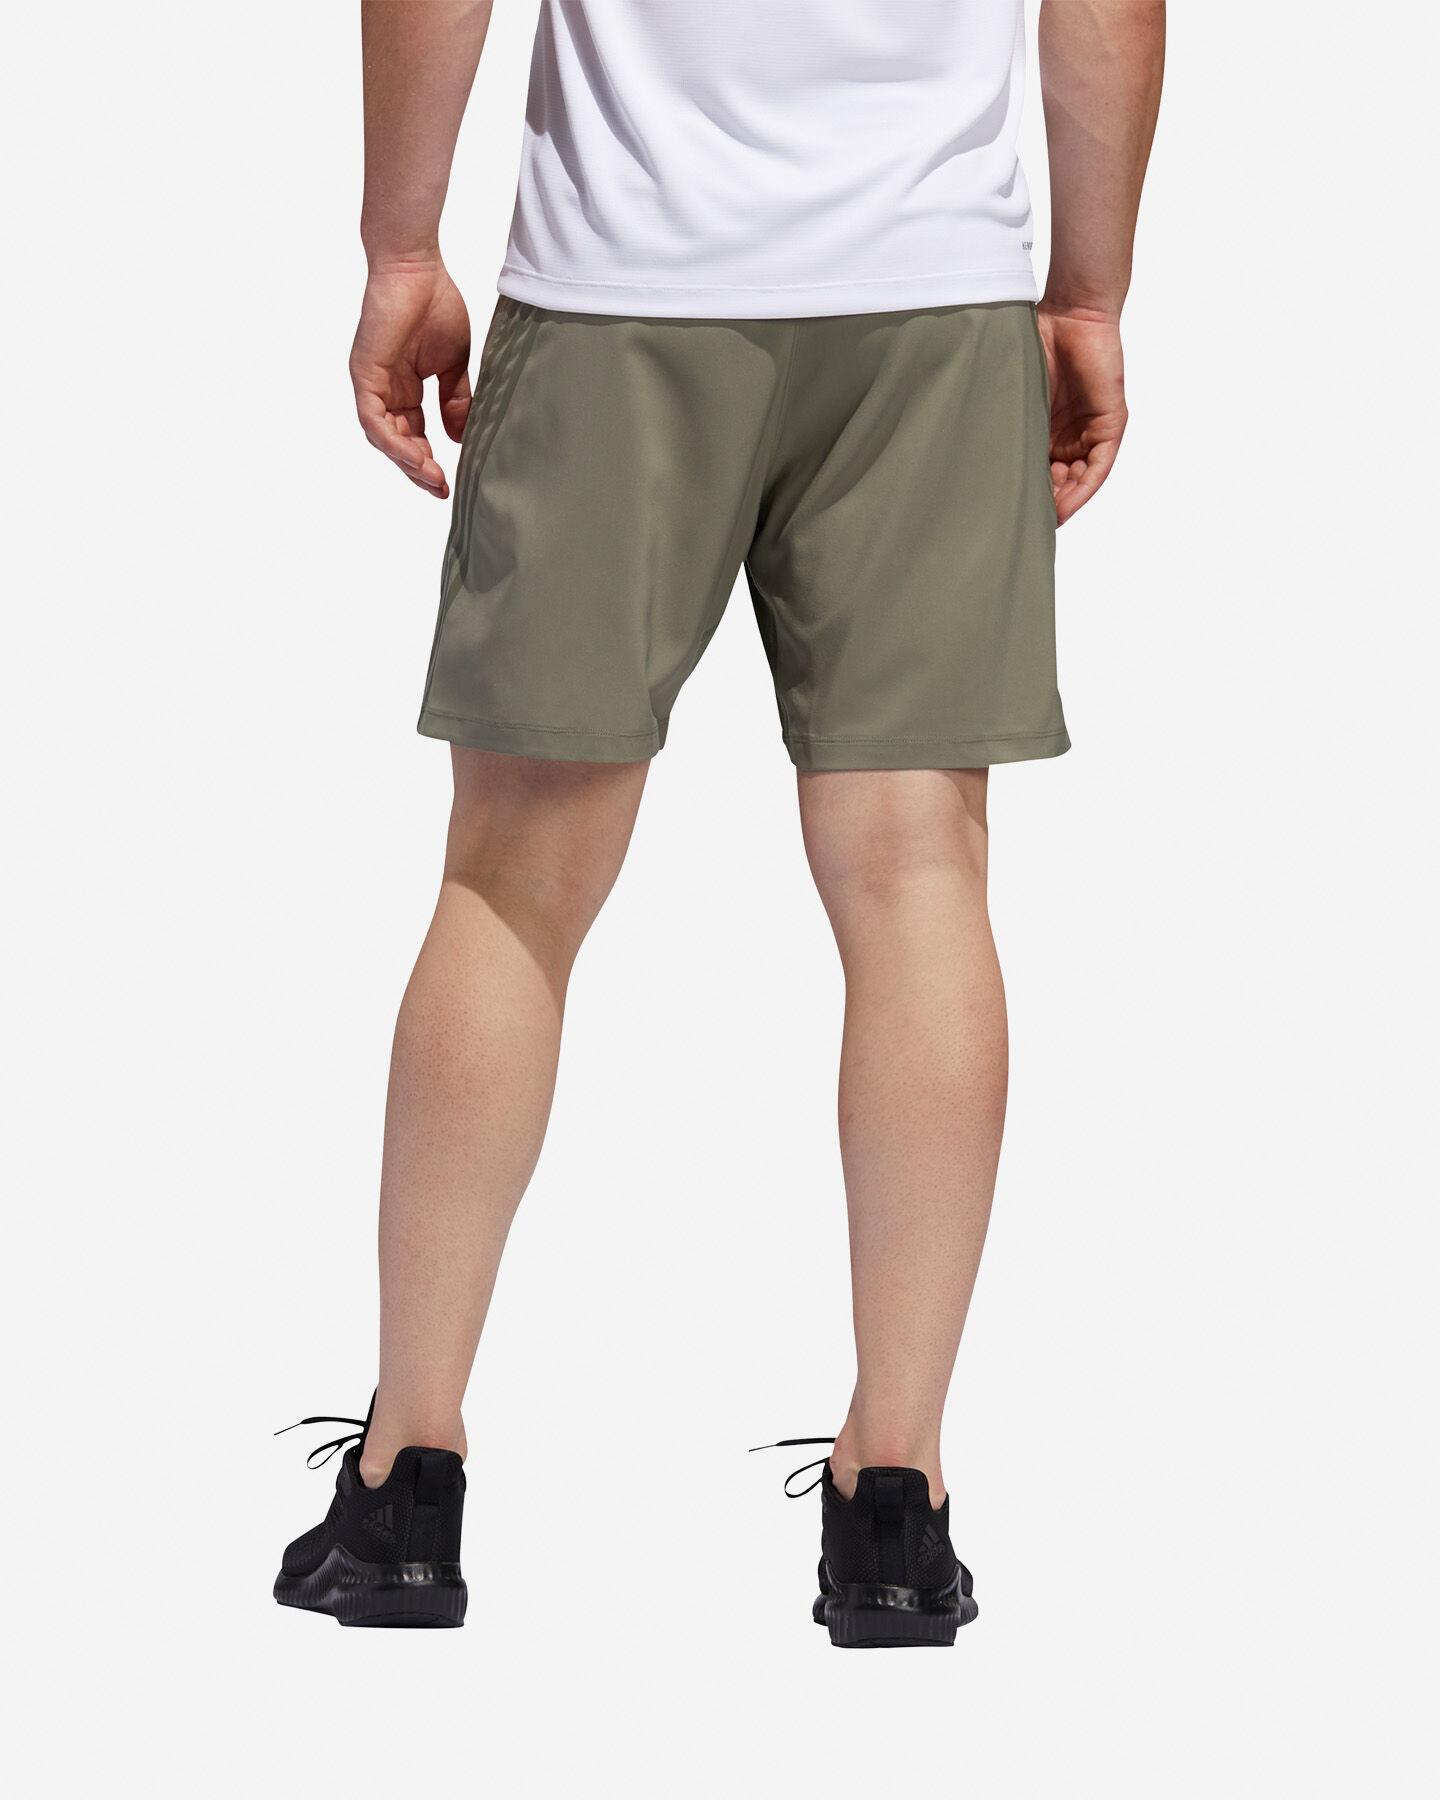 Pantalone training ADIDAS AEROREADY 3-STRIPES 8-INCH M S5154649 scatto 4